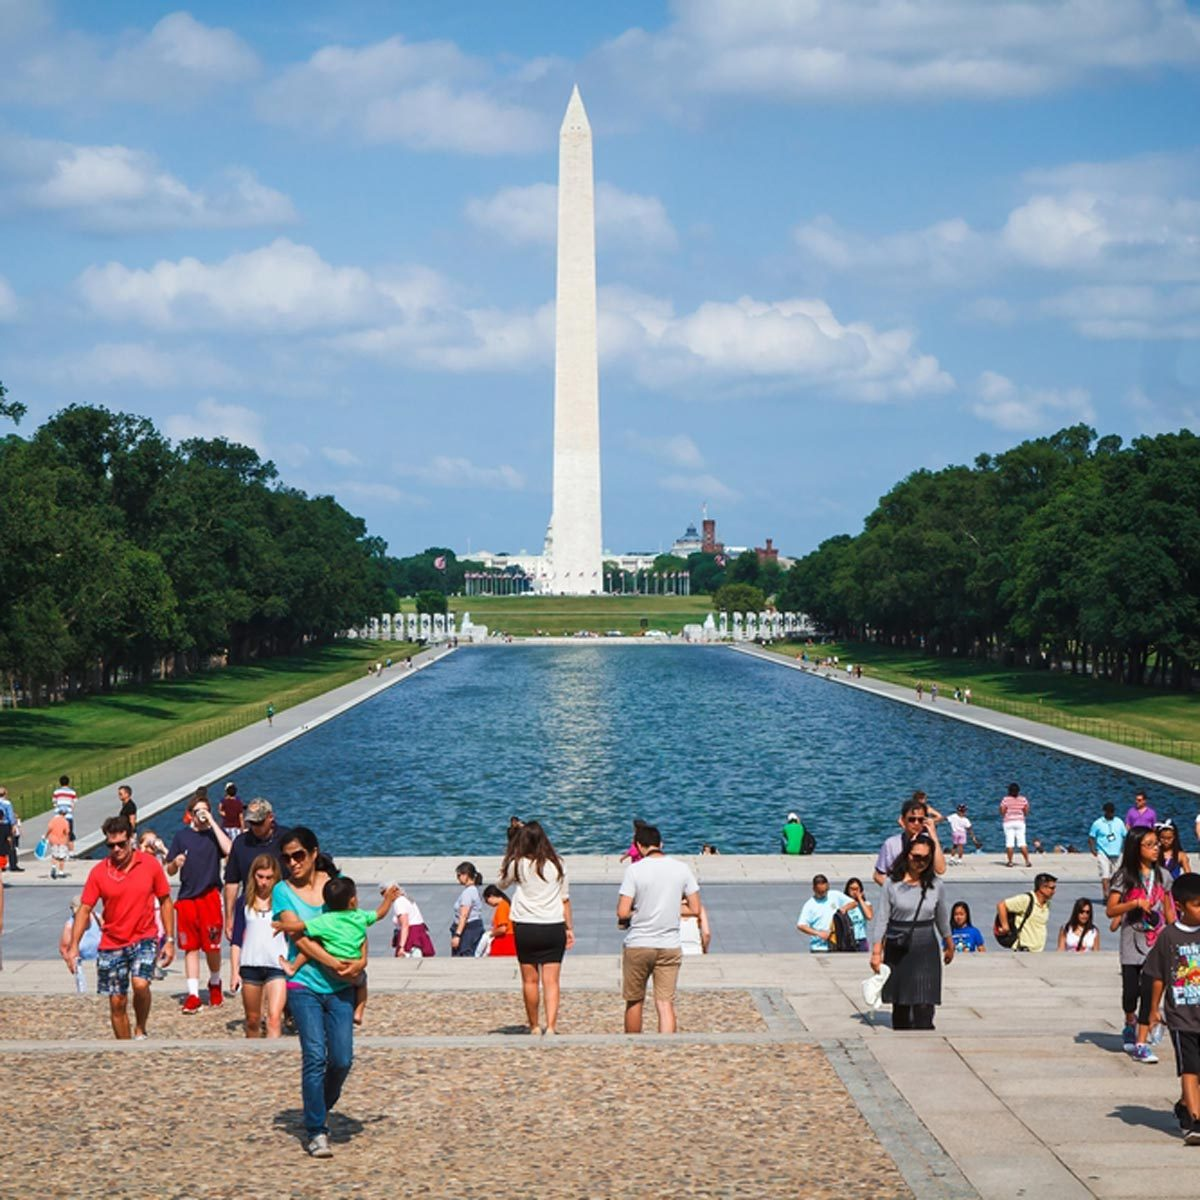 Orkin Locations & Hours Near Washington, DC - YP.com